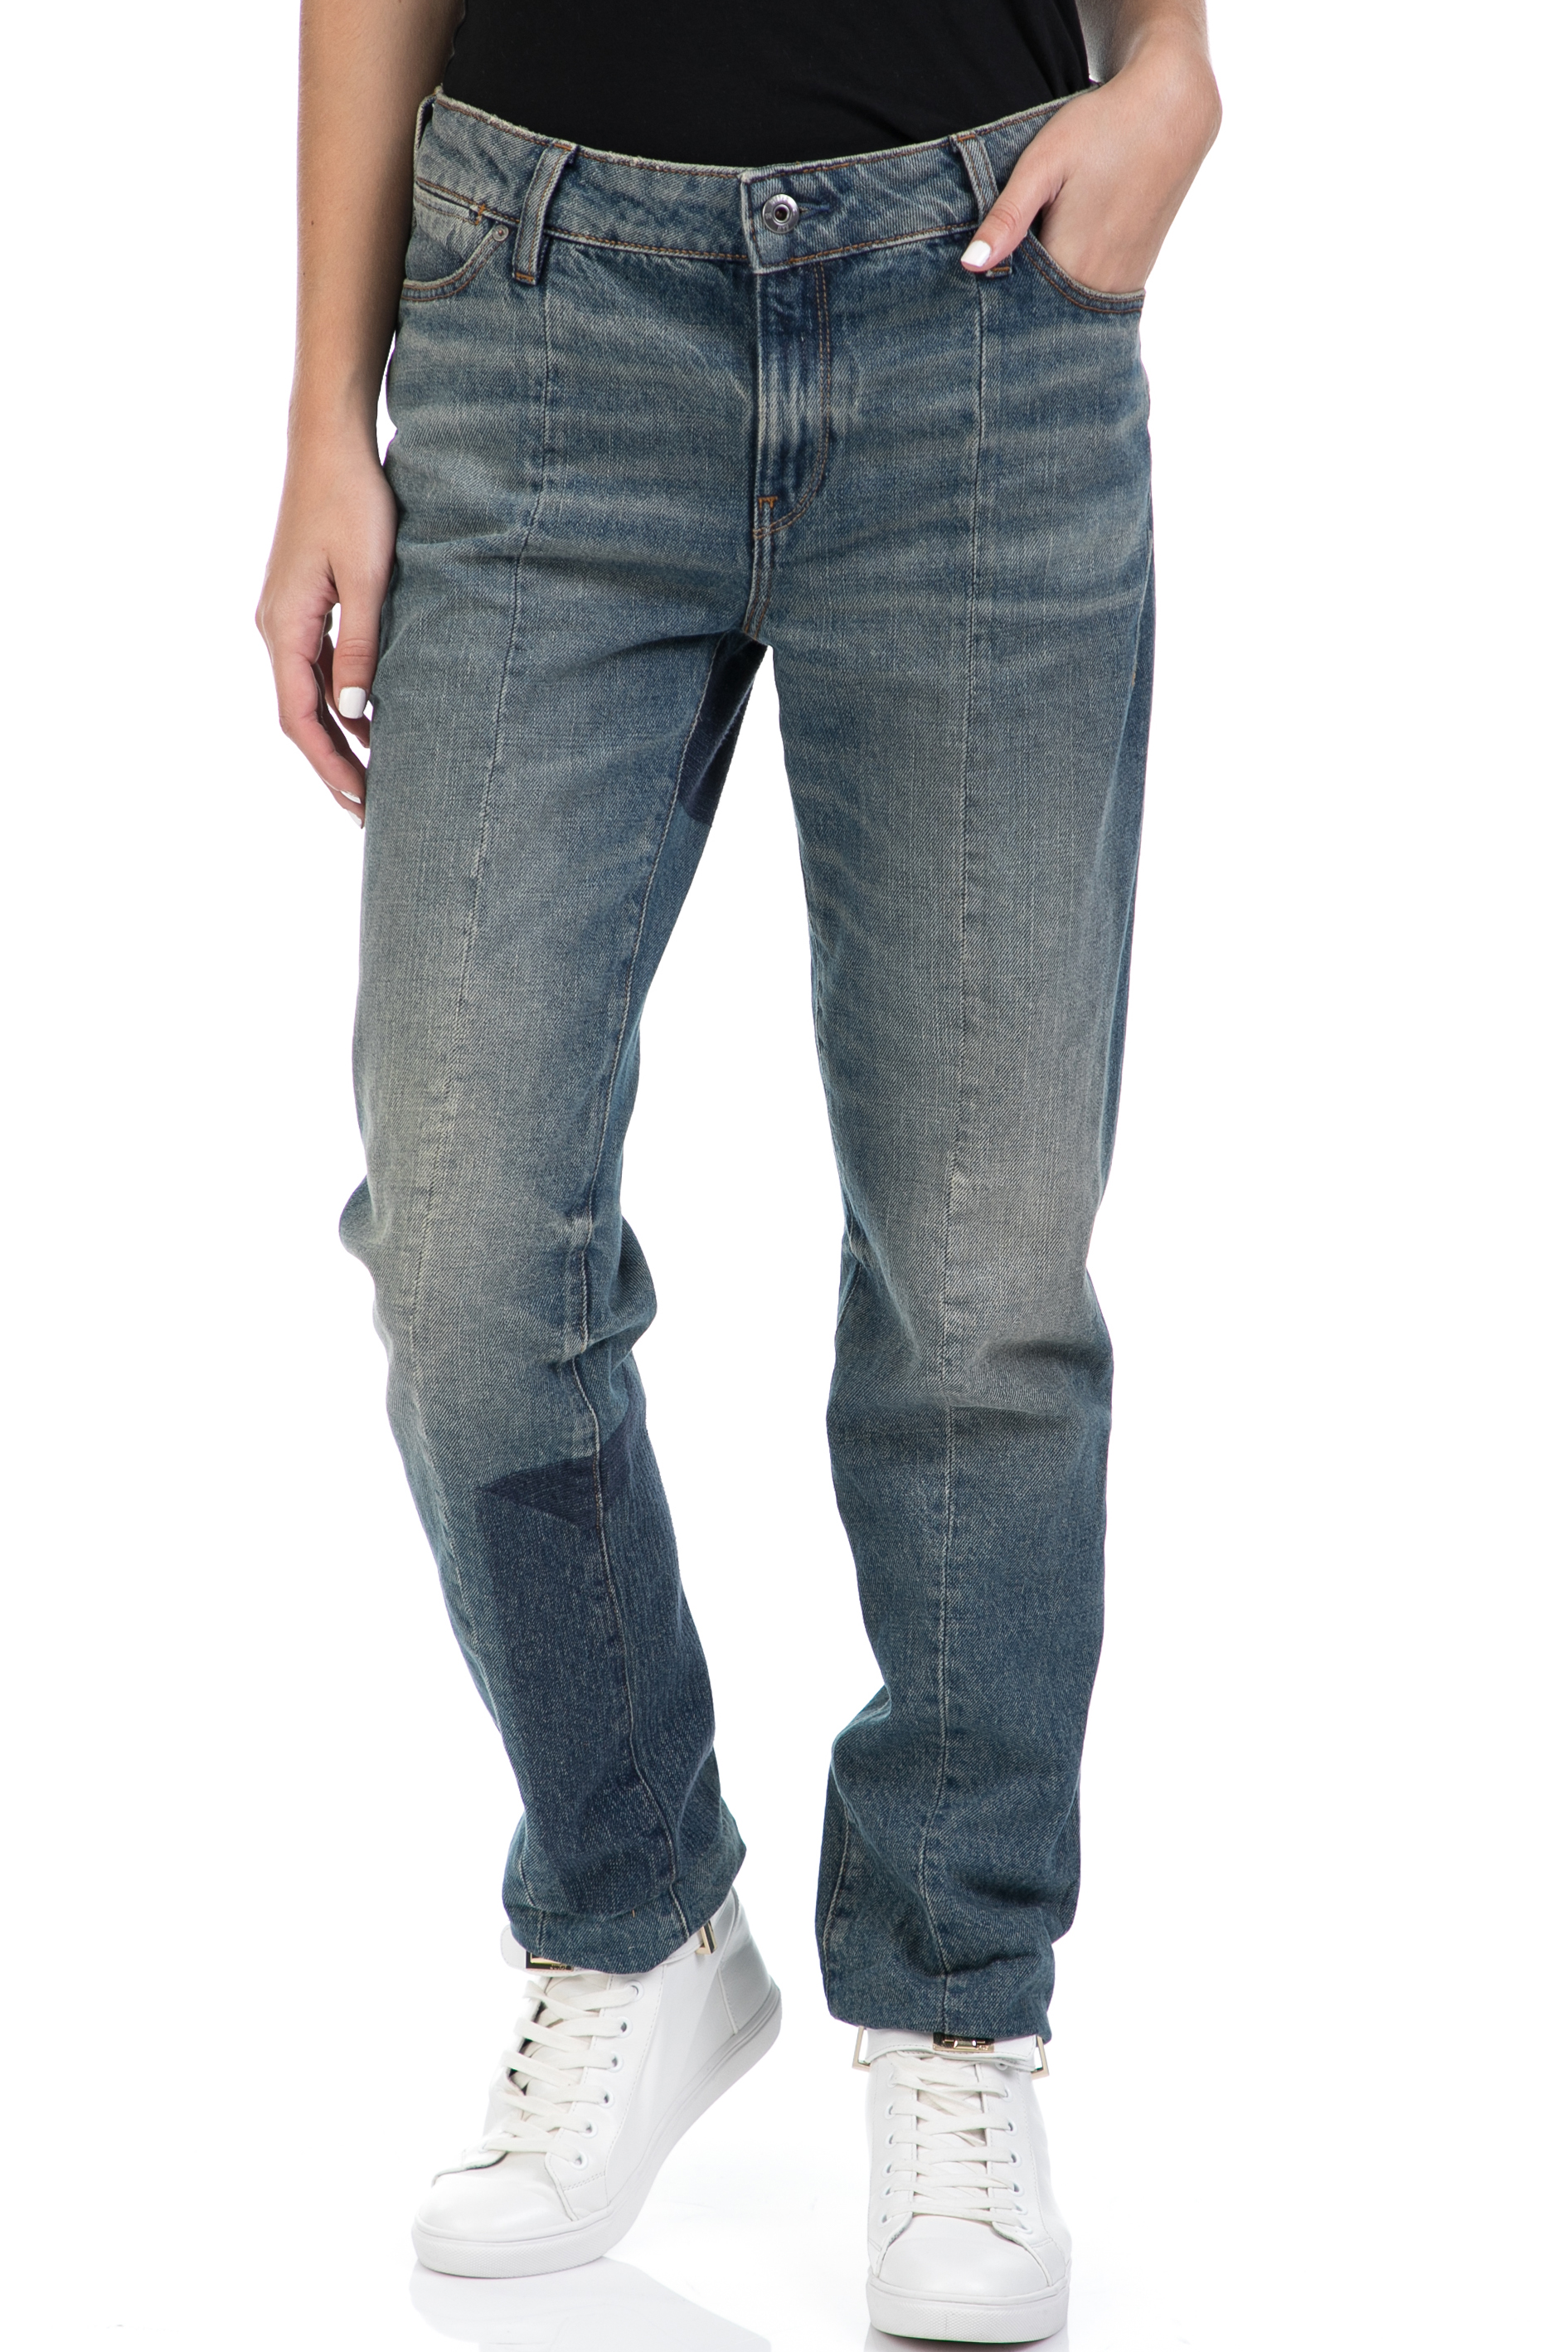 G-STAR - Γυναικείο τζιν παντελόνι G-STAR RAW μπλε